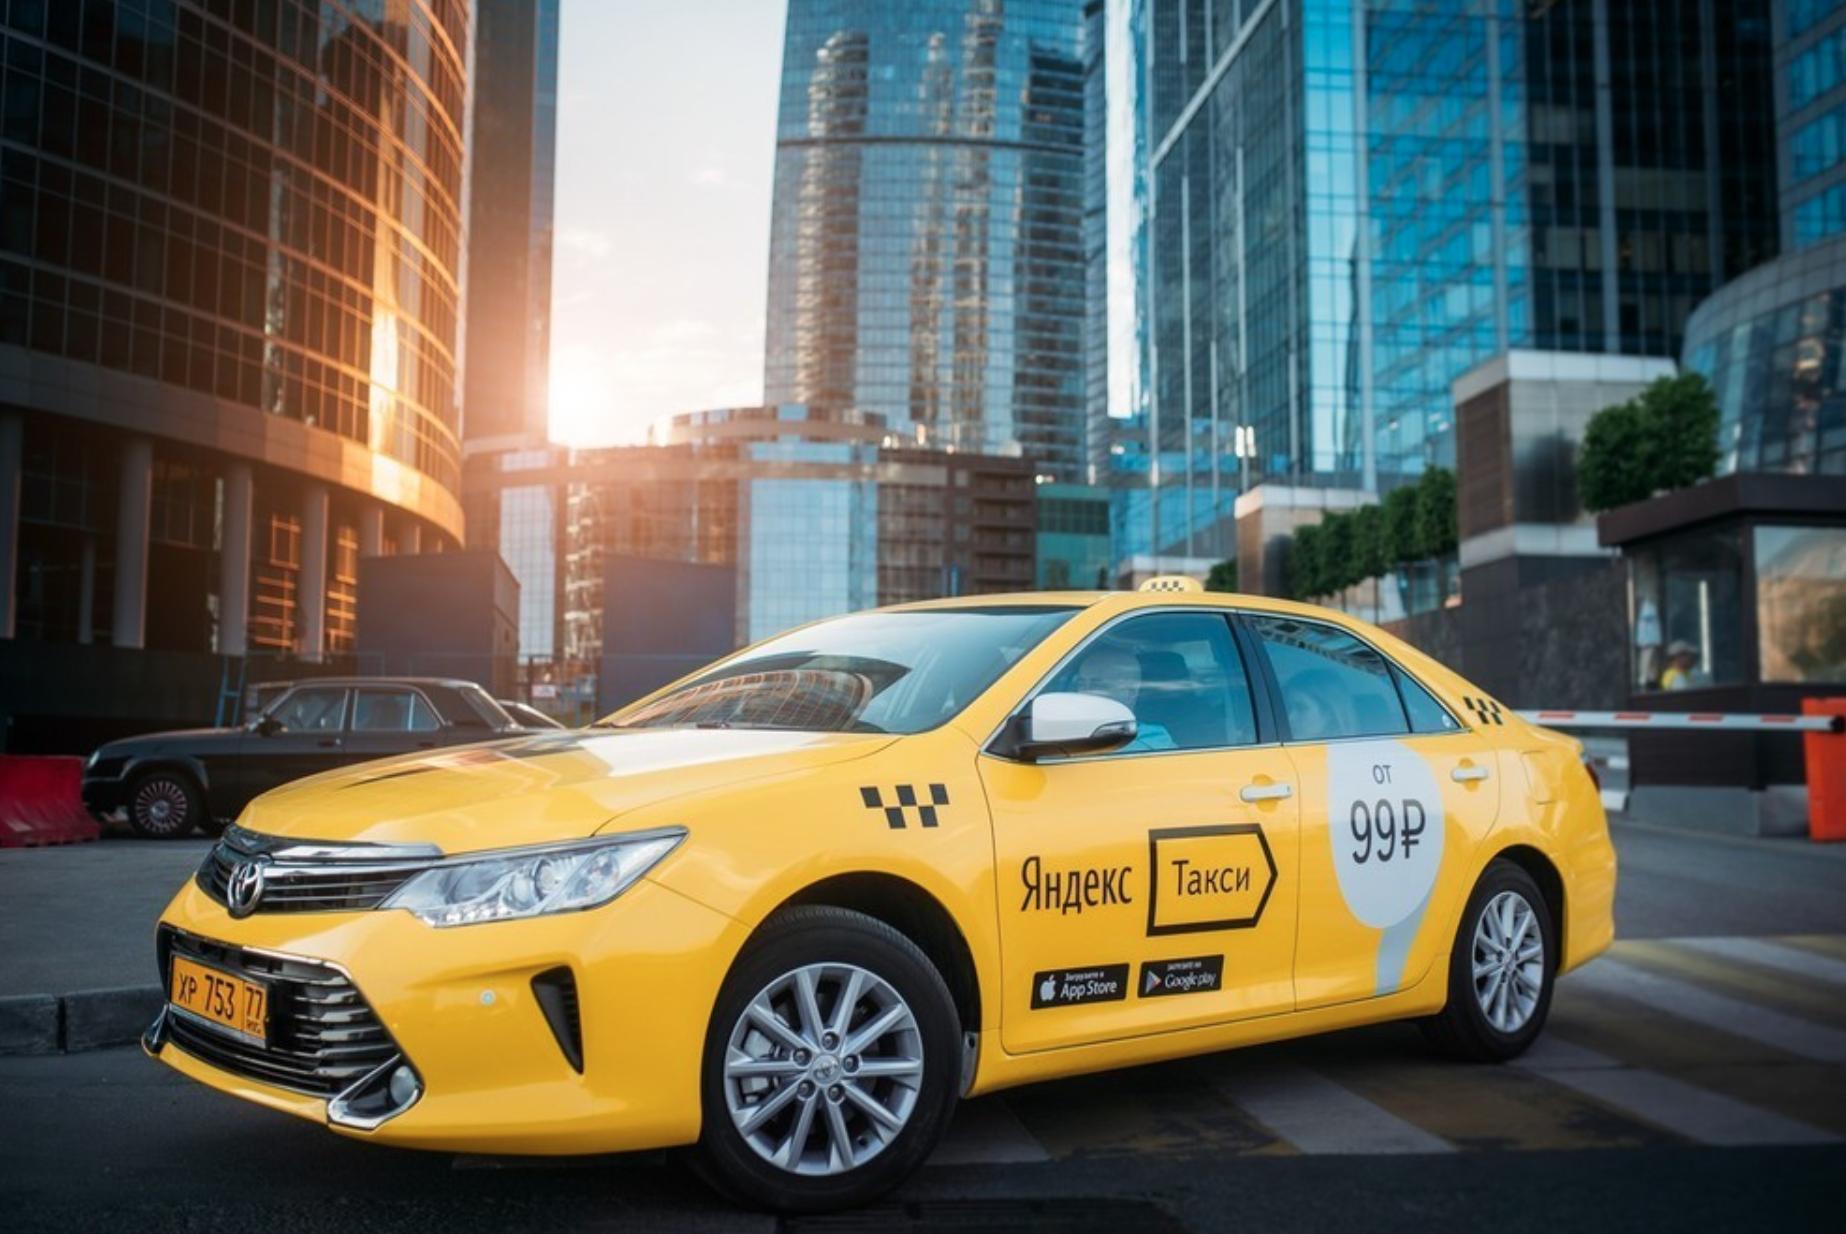 Яндекс Такси популярная работа водителем в Уфе